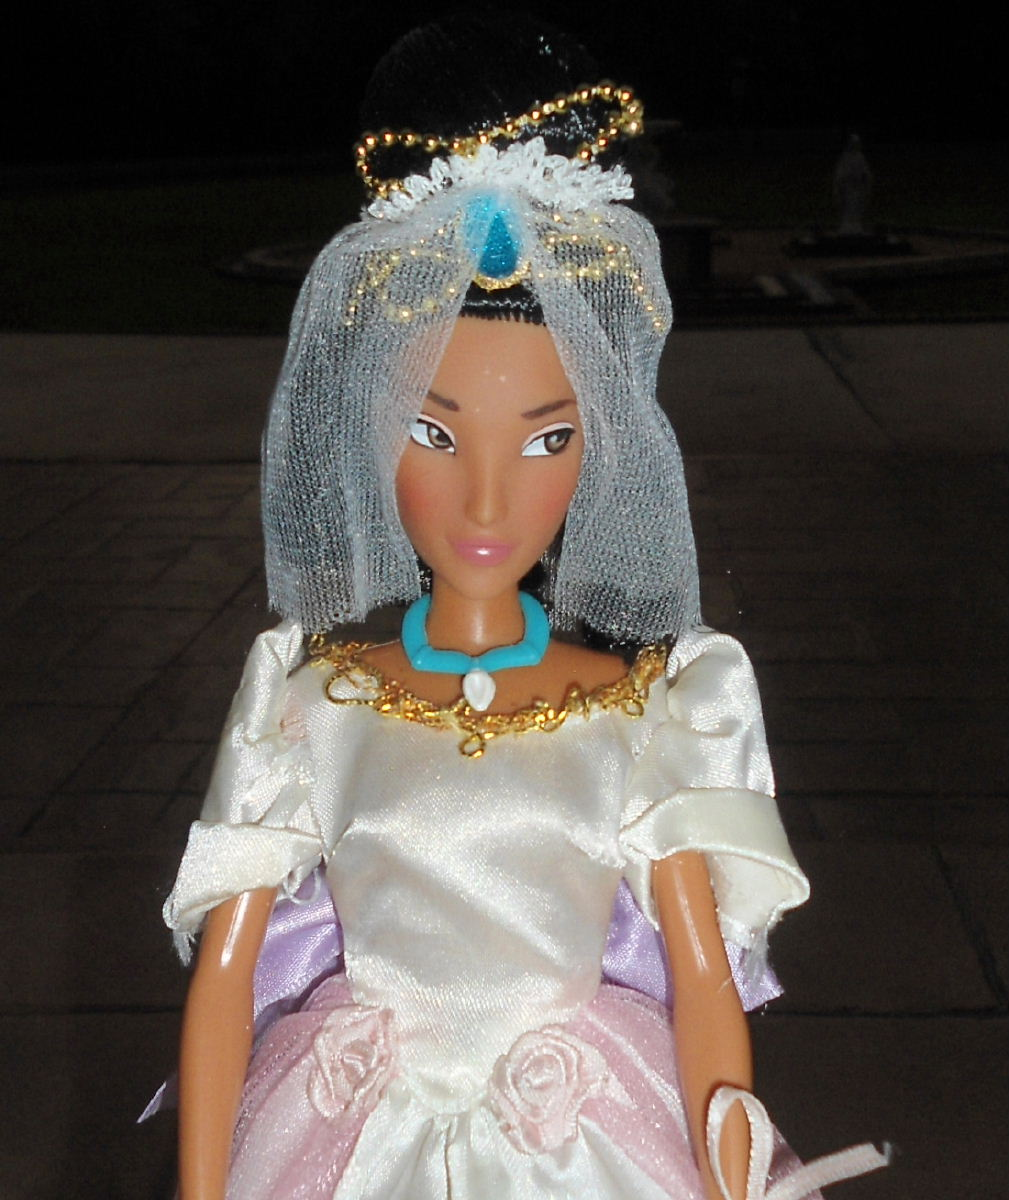 John Amp Pocahontas 11 Quot Wedding Doll Set